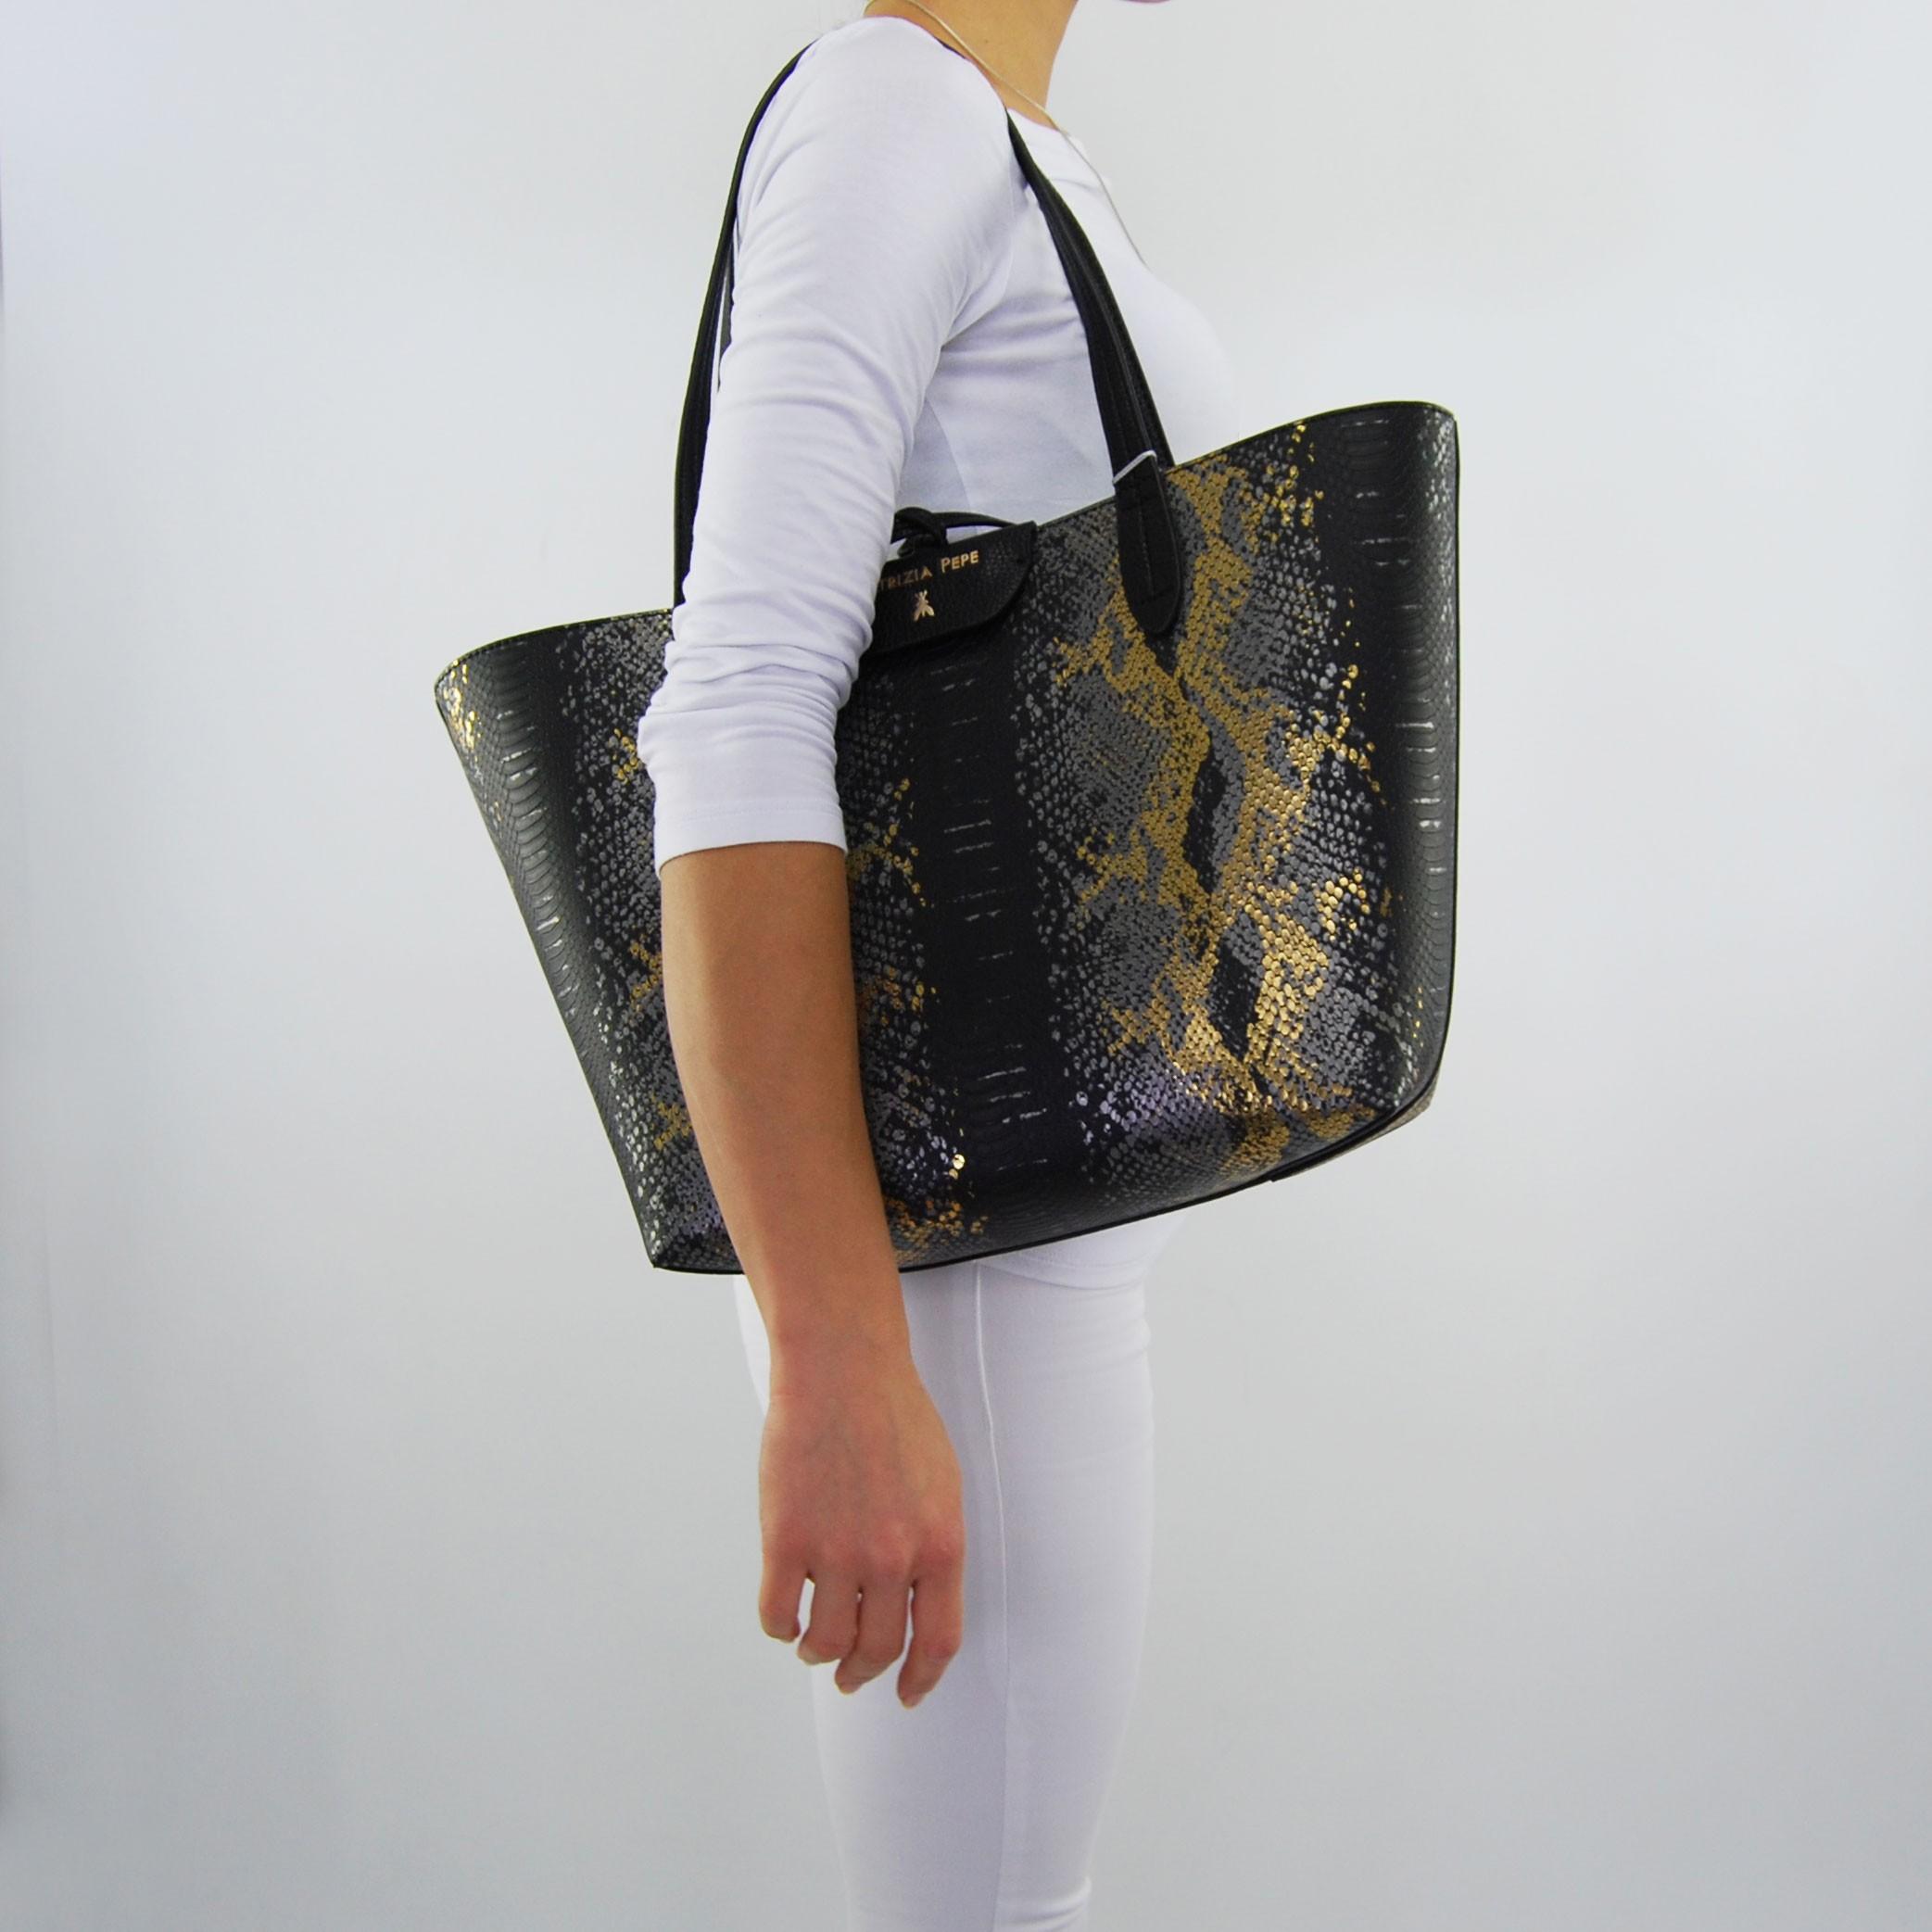 7d268882df Shopping bag reversible Patrizia Pepe black gold python. Tap to expand